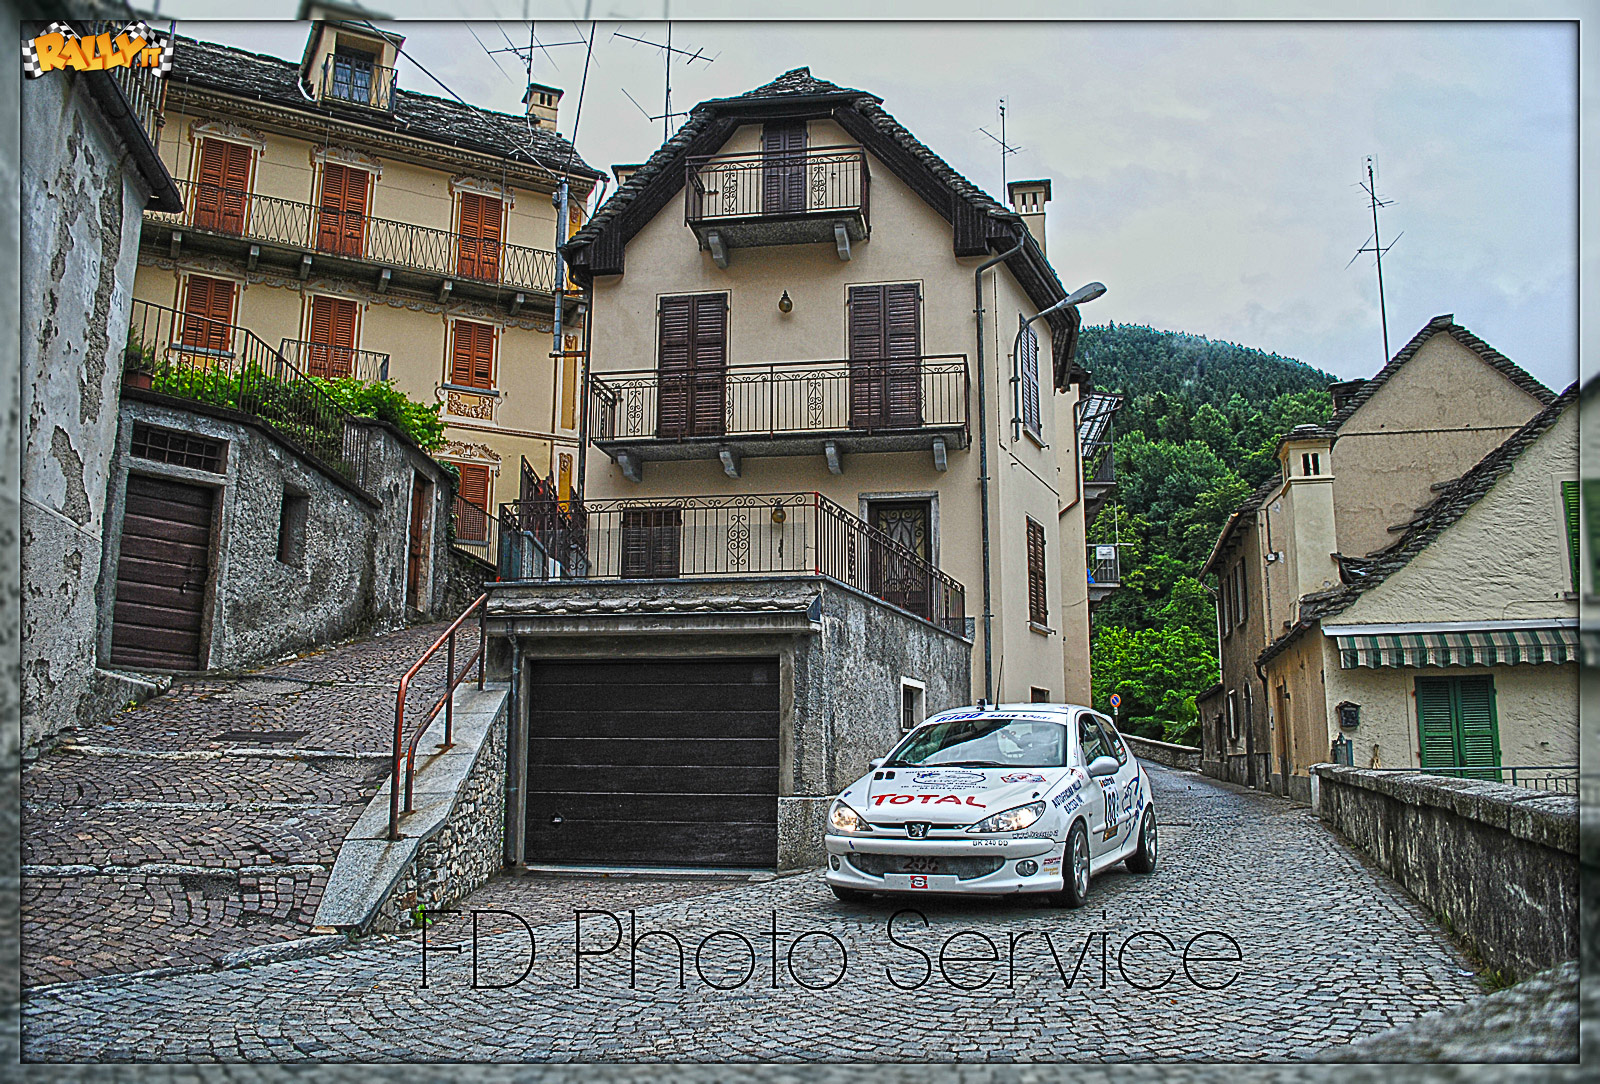 030-Rally-Valli-Ossolane-Ferrari-2014-Rally_it.jpg